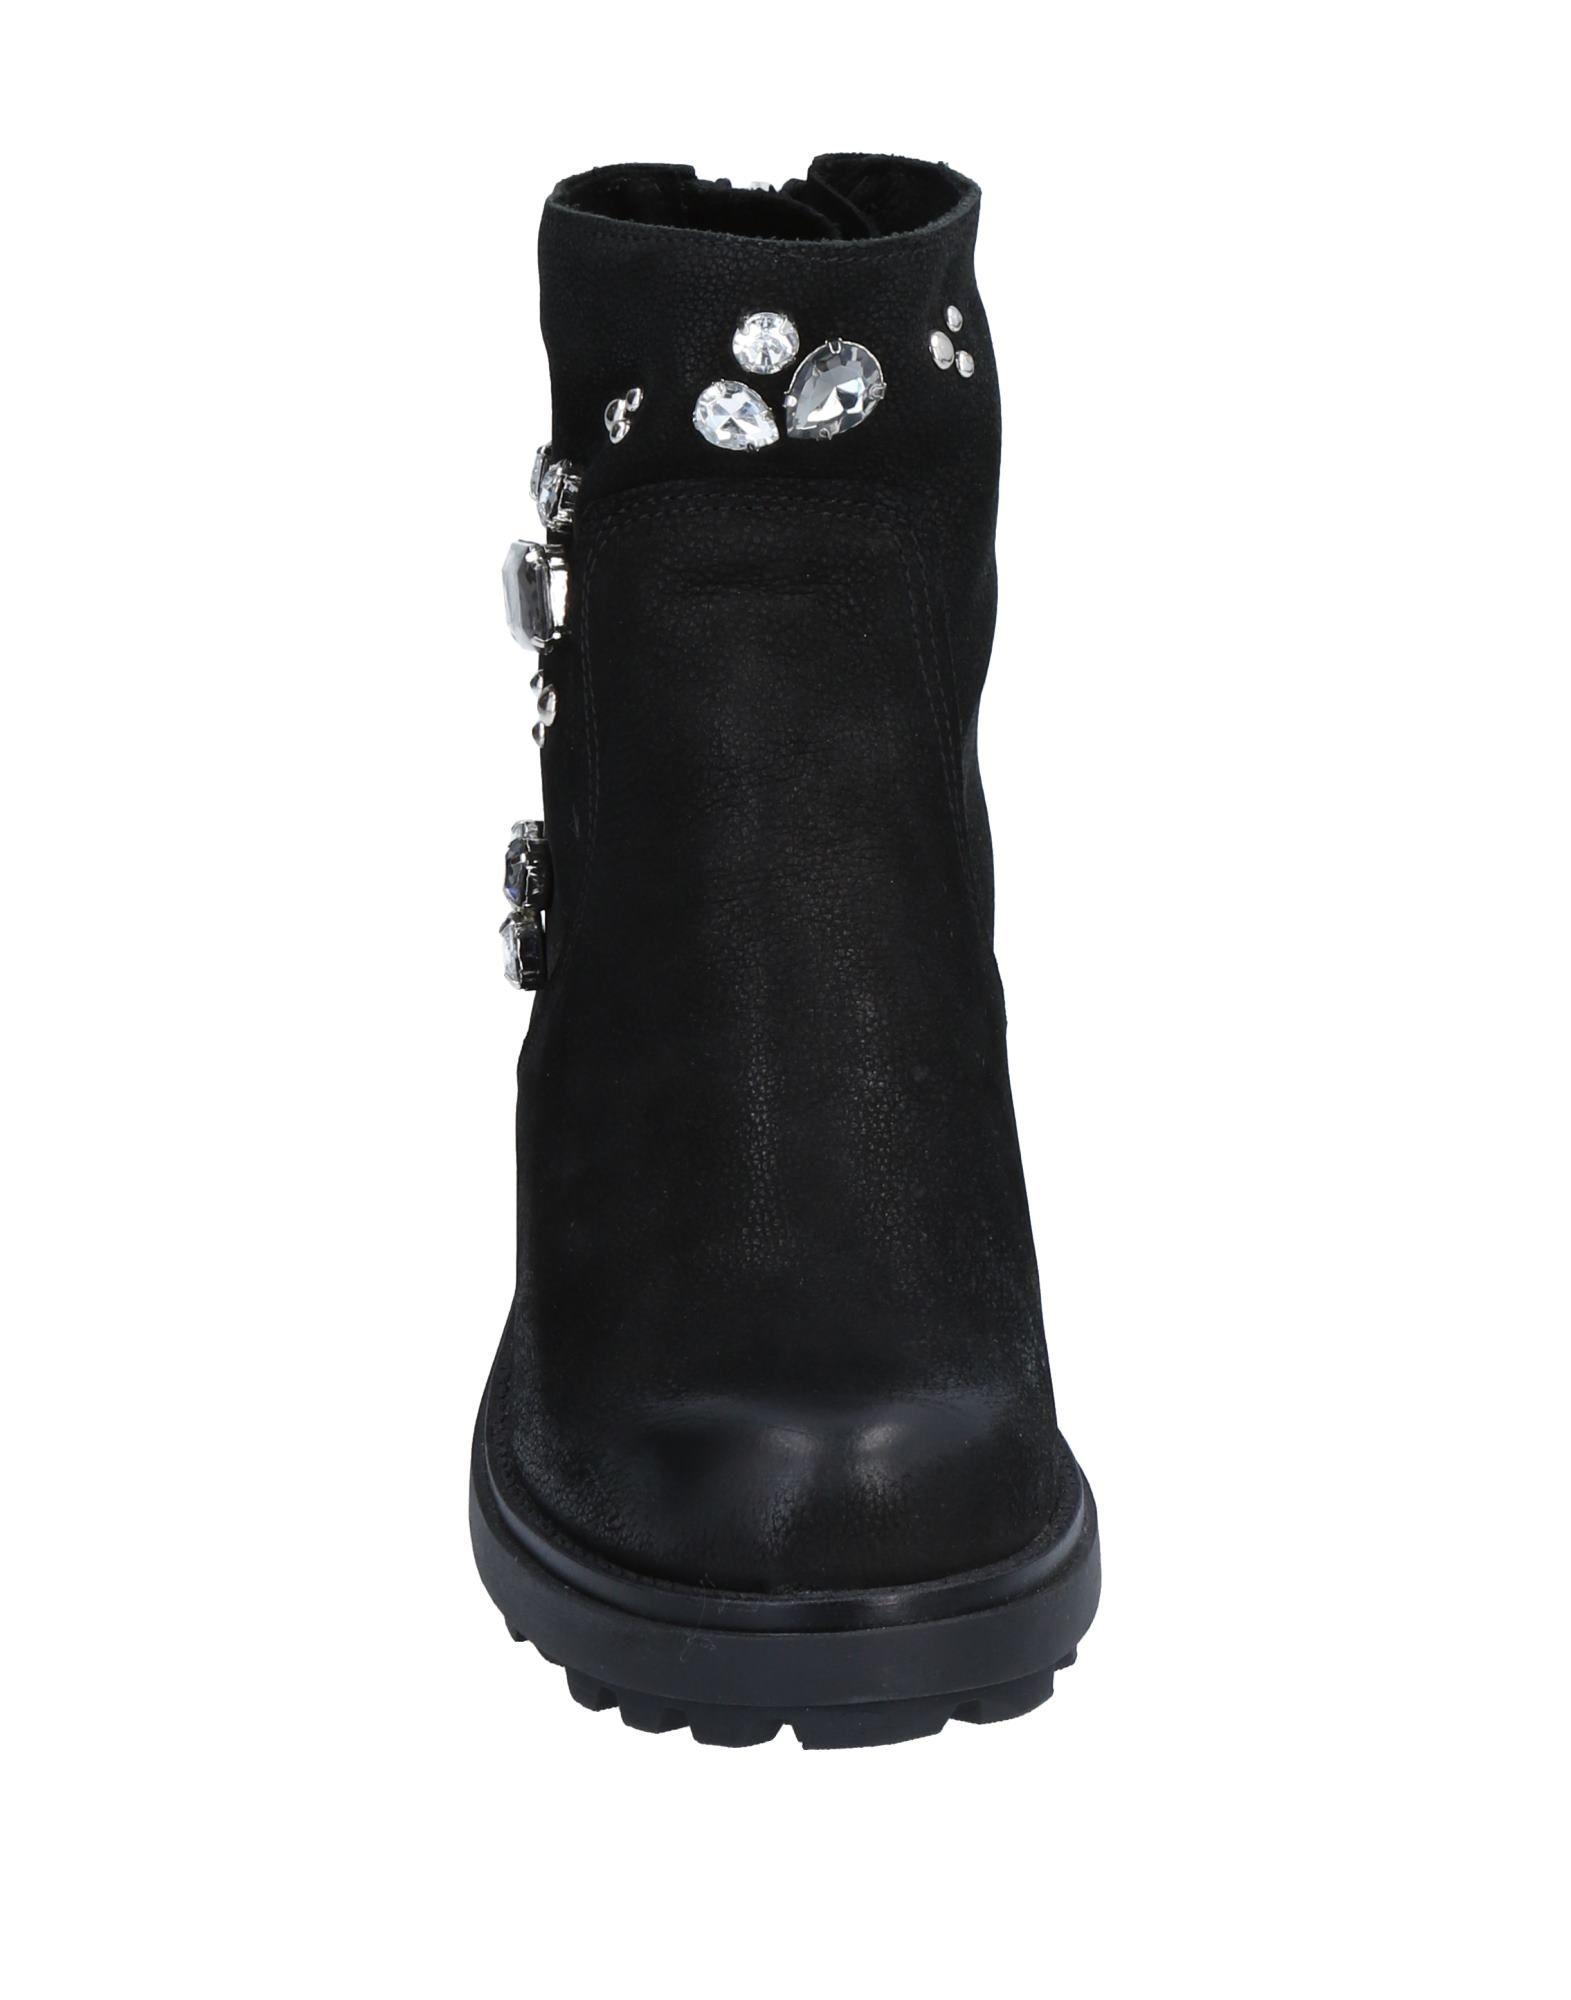 Rabatt Schuhe Onako' Stiefelette  Damen  Stiefelette 11526225GG 6b6df0